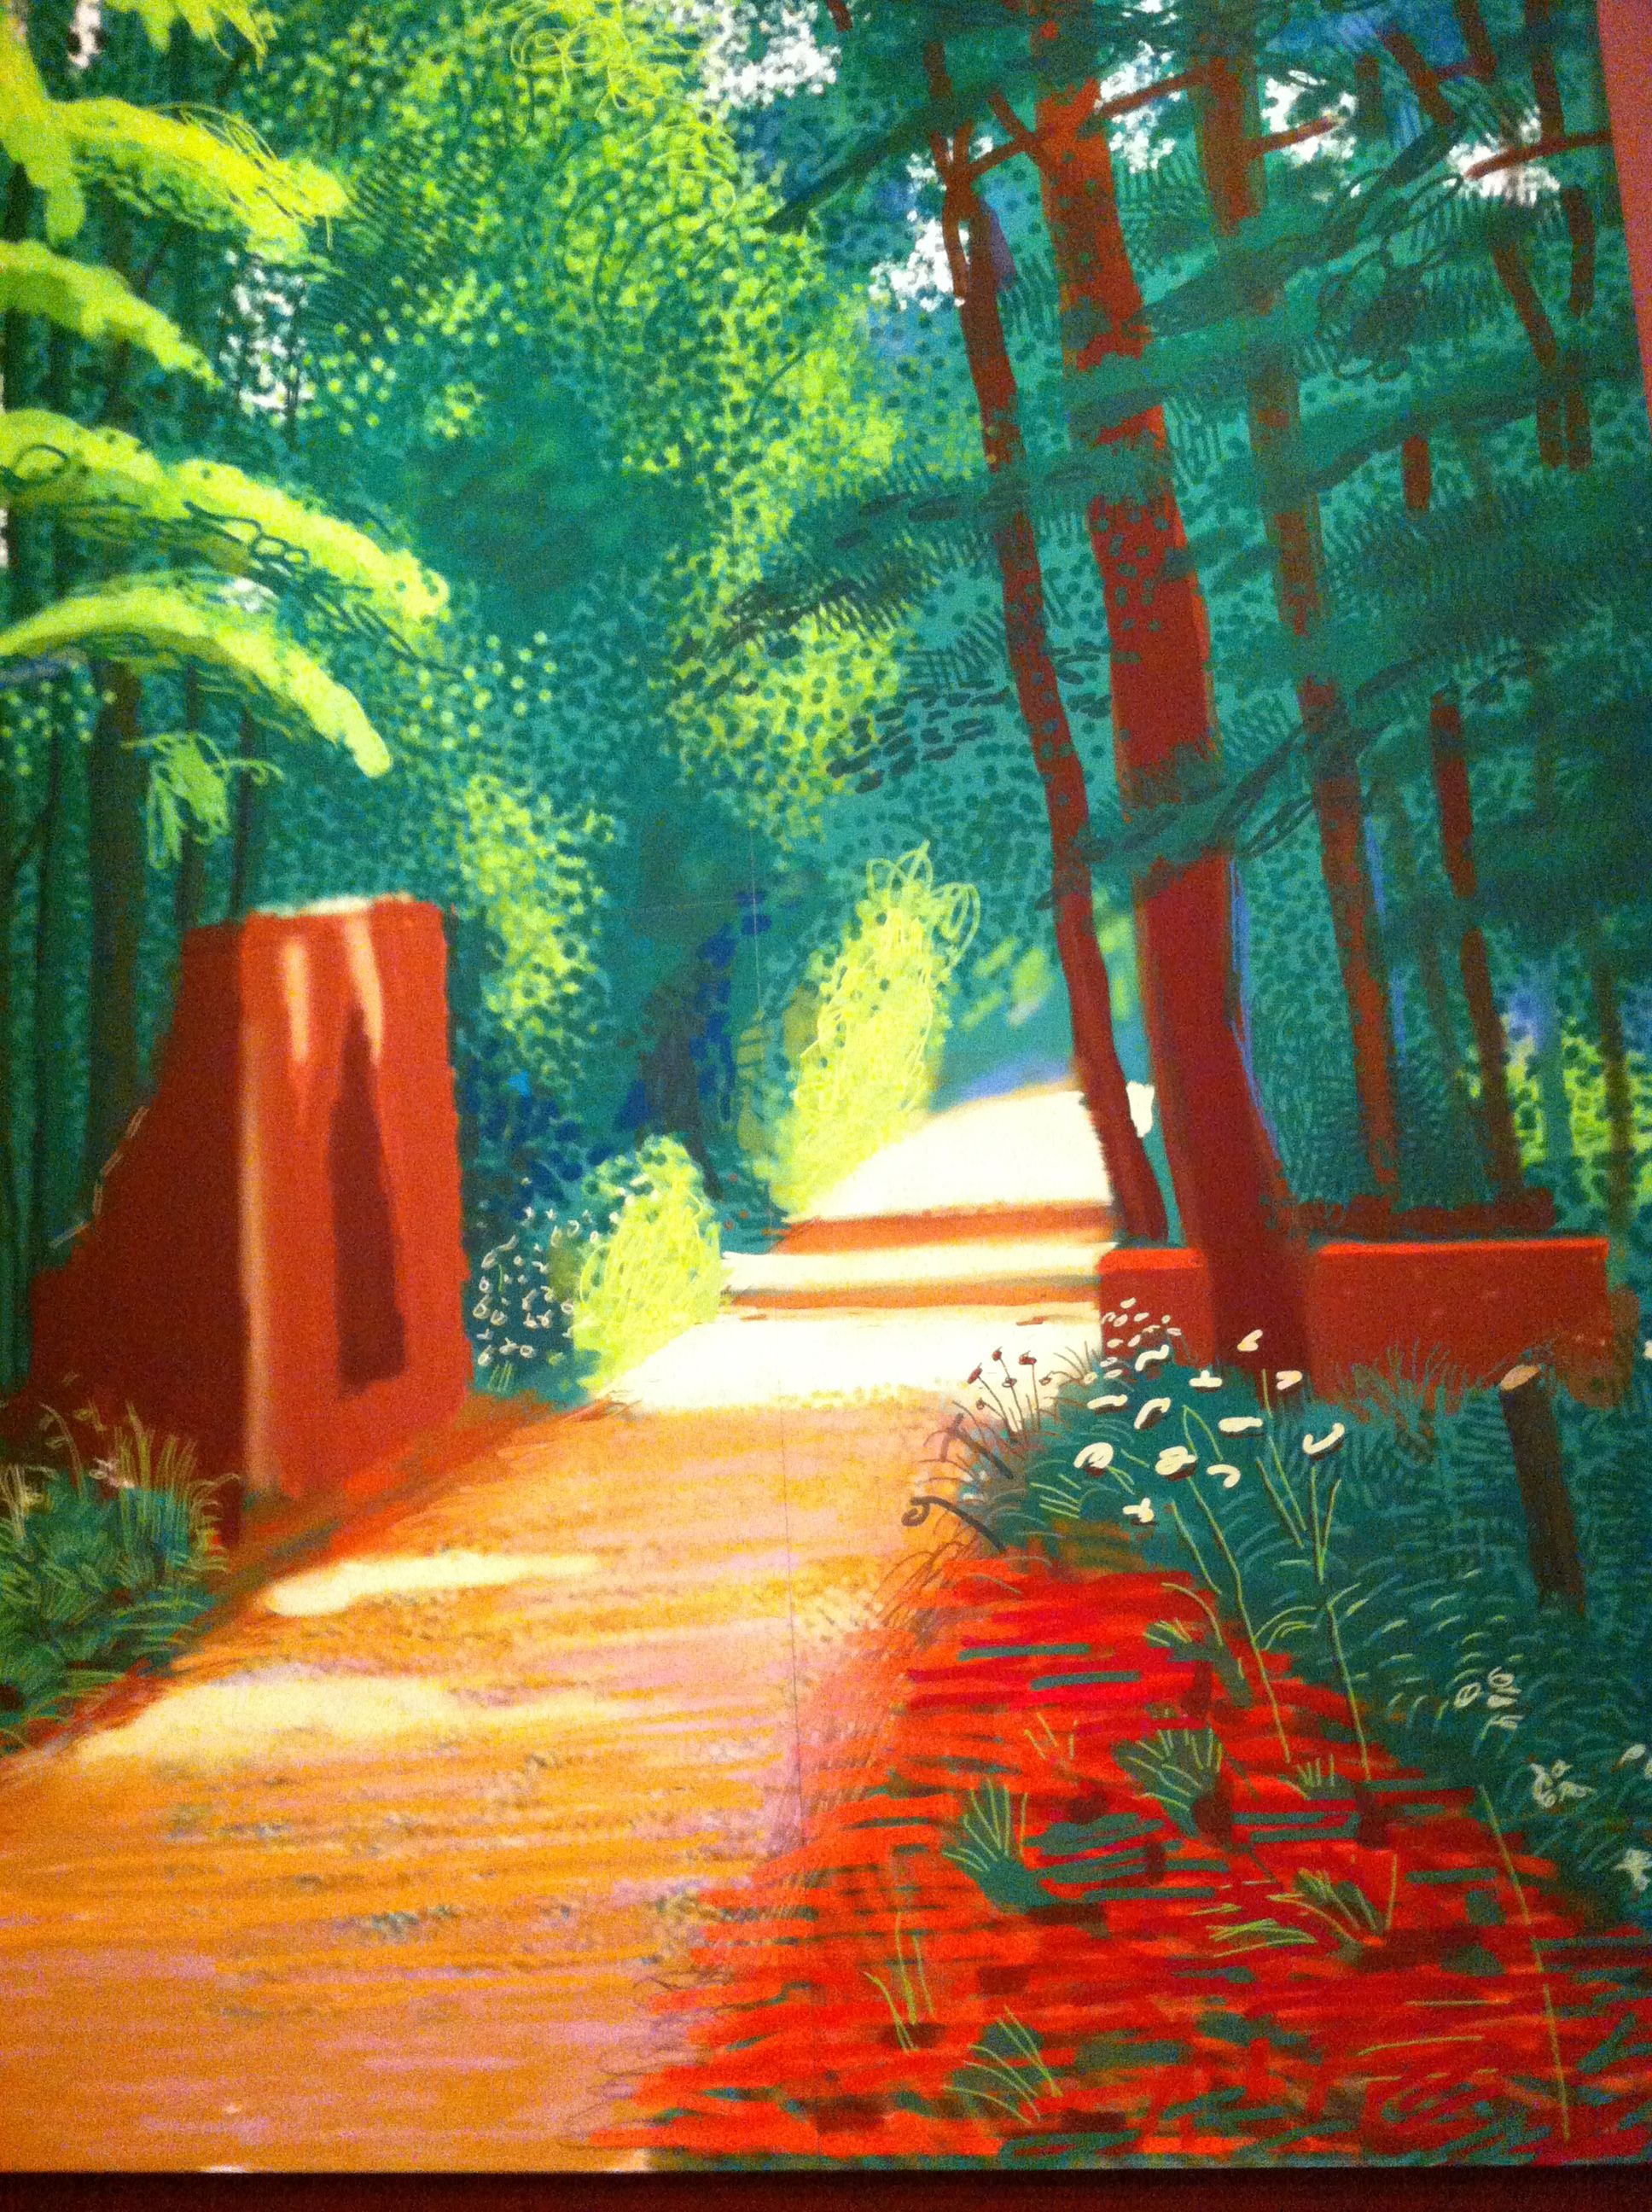 David hockney 39 s very beautiful ipad art art for David hockney painting